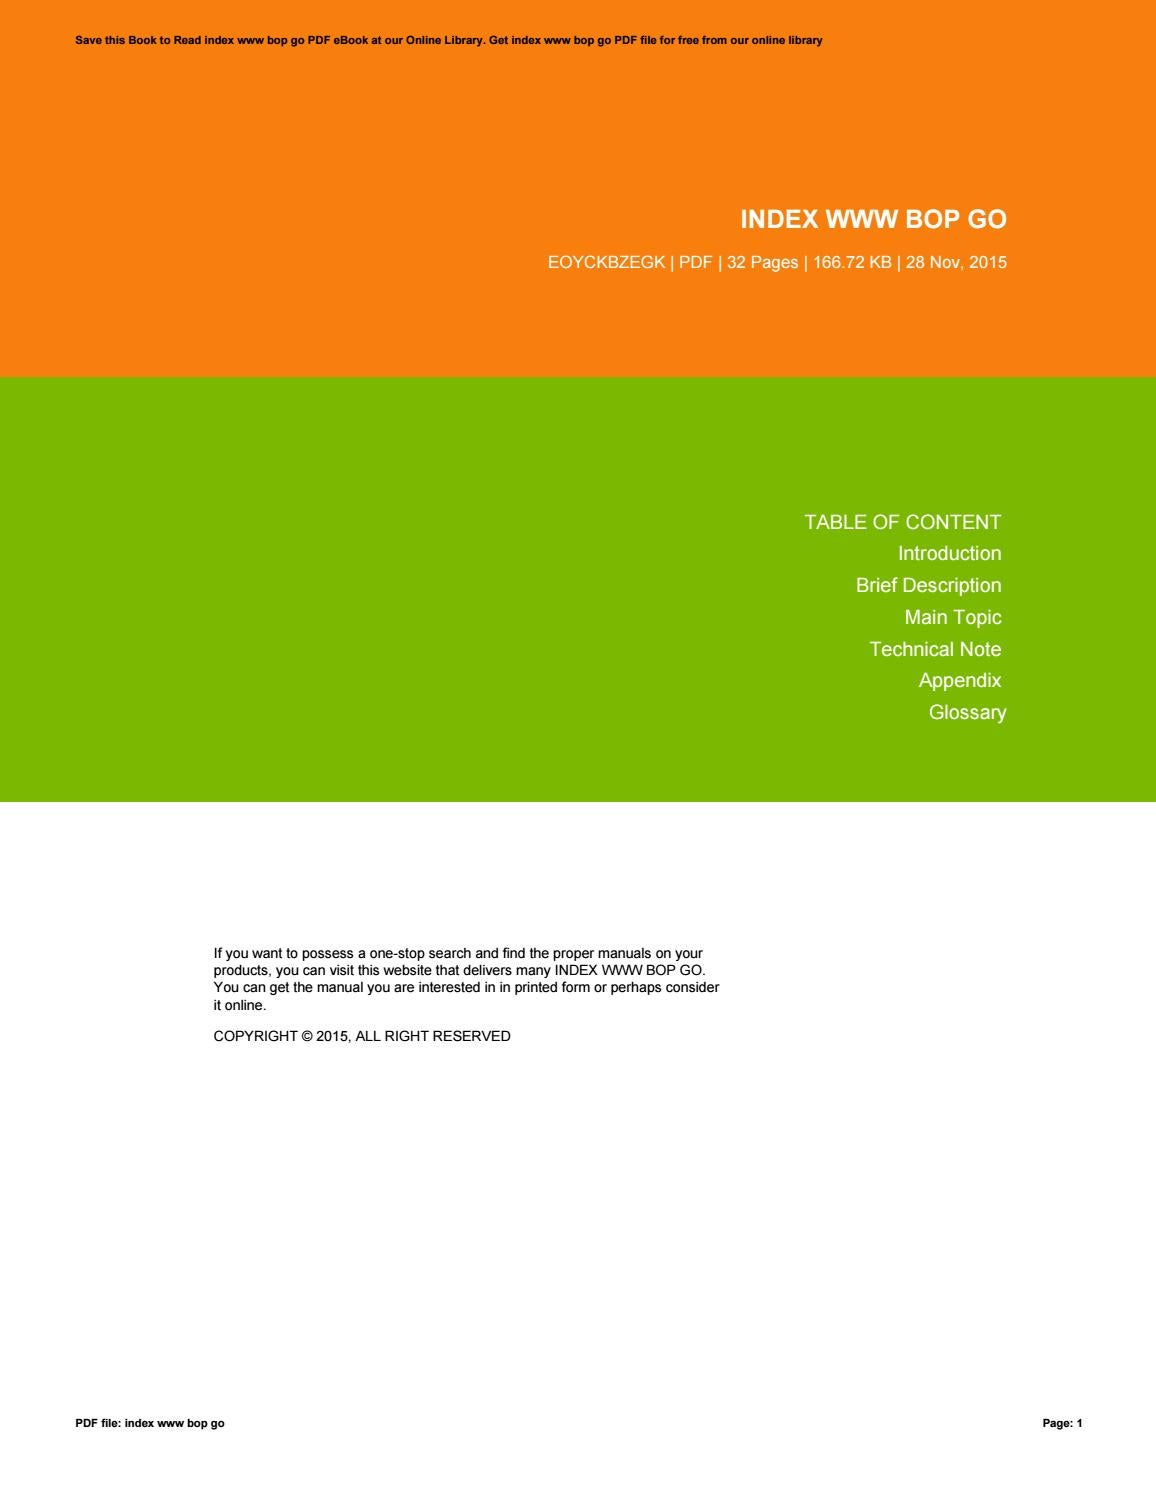 shafferbopmanual 180116083406 thumbnail 4 jpg cb u003d1516091804 Array -  hydril annular gxs bop manual ebook rh hydril annular gxs bop manual ebook  angelayu